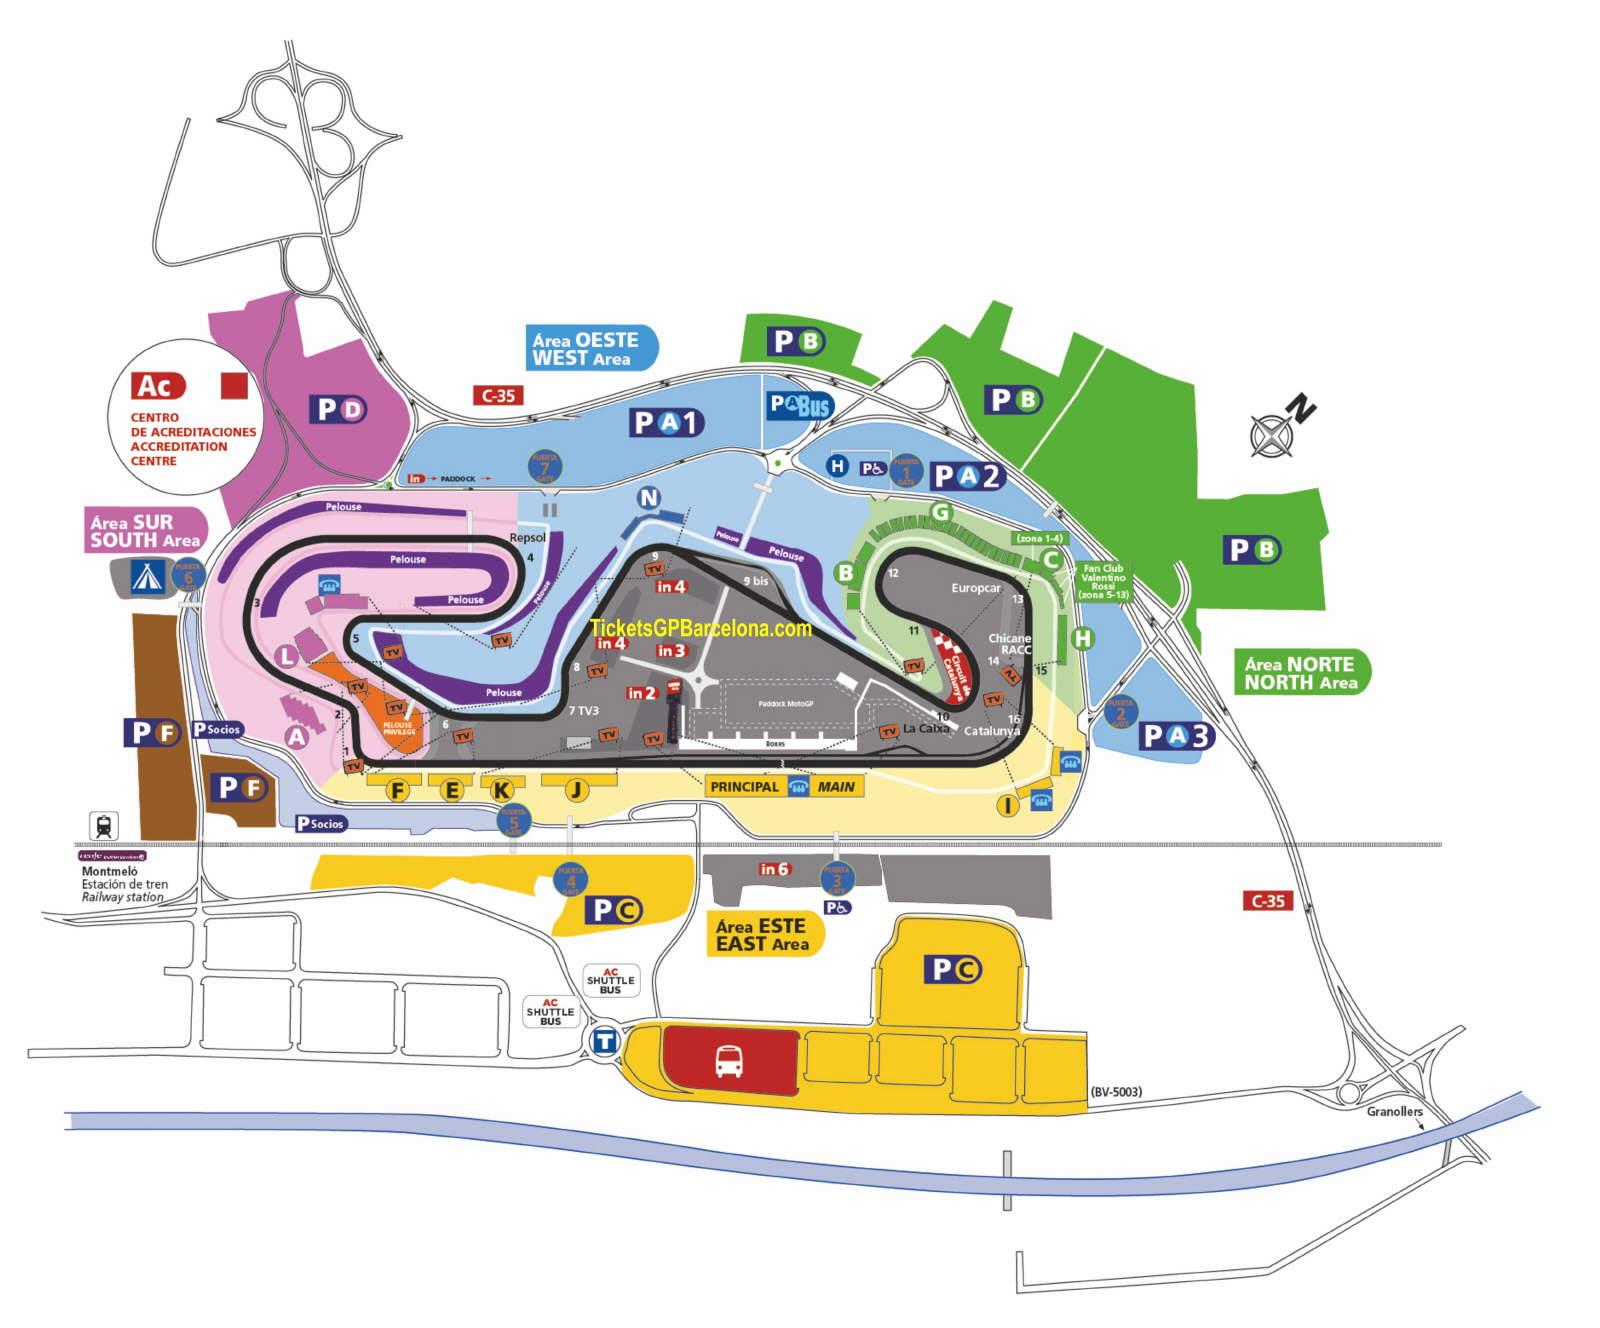 Circuit De Catalunya Montmelo Barcelona Tickets Gp Barcelona Com Official Ticketing F1 Motogp